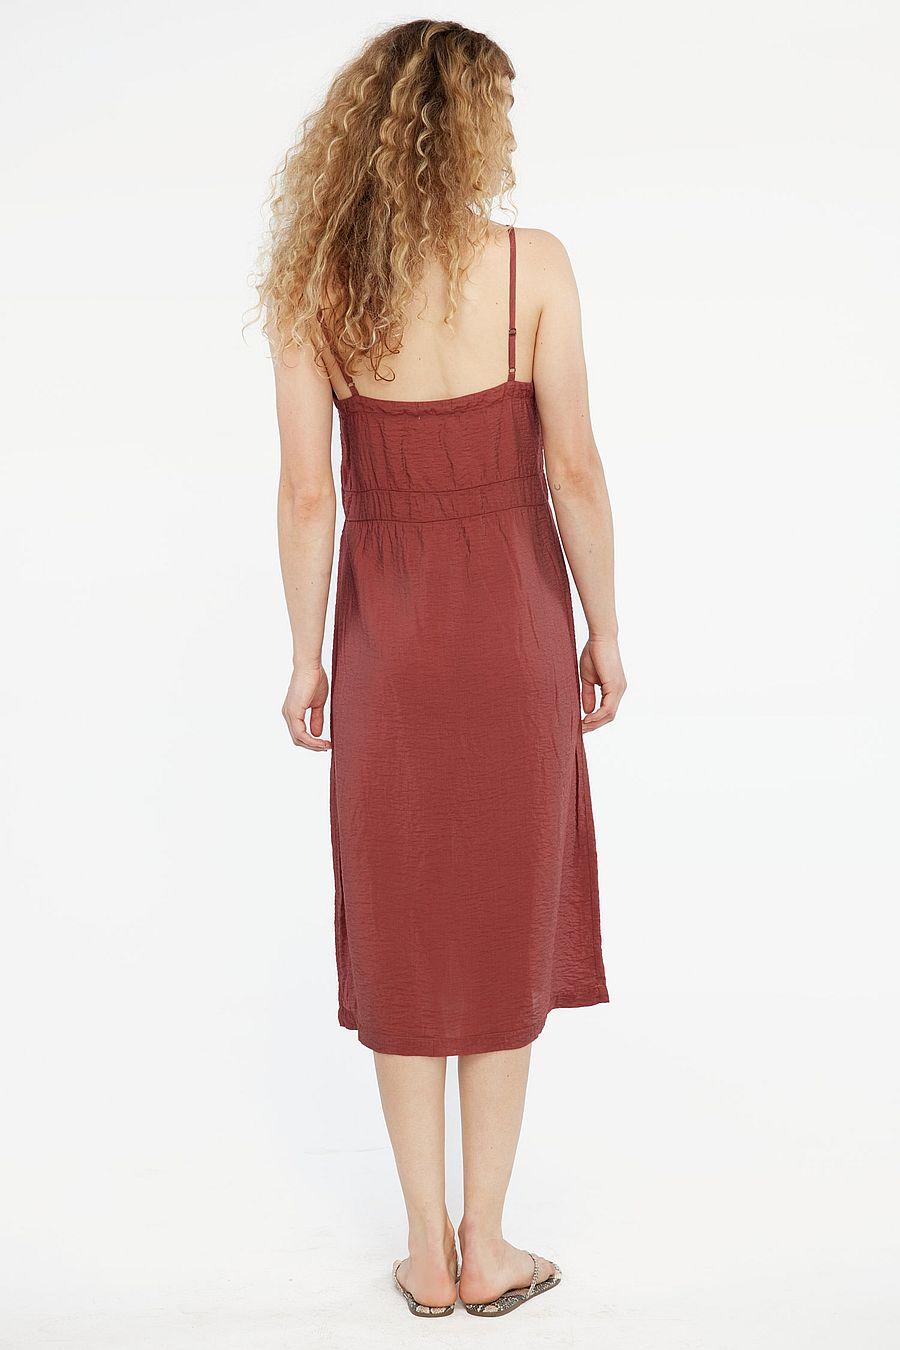 LACAUSA Clothing Alma Slip Dress - Cocoa